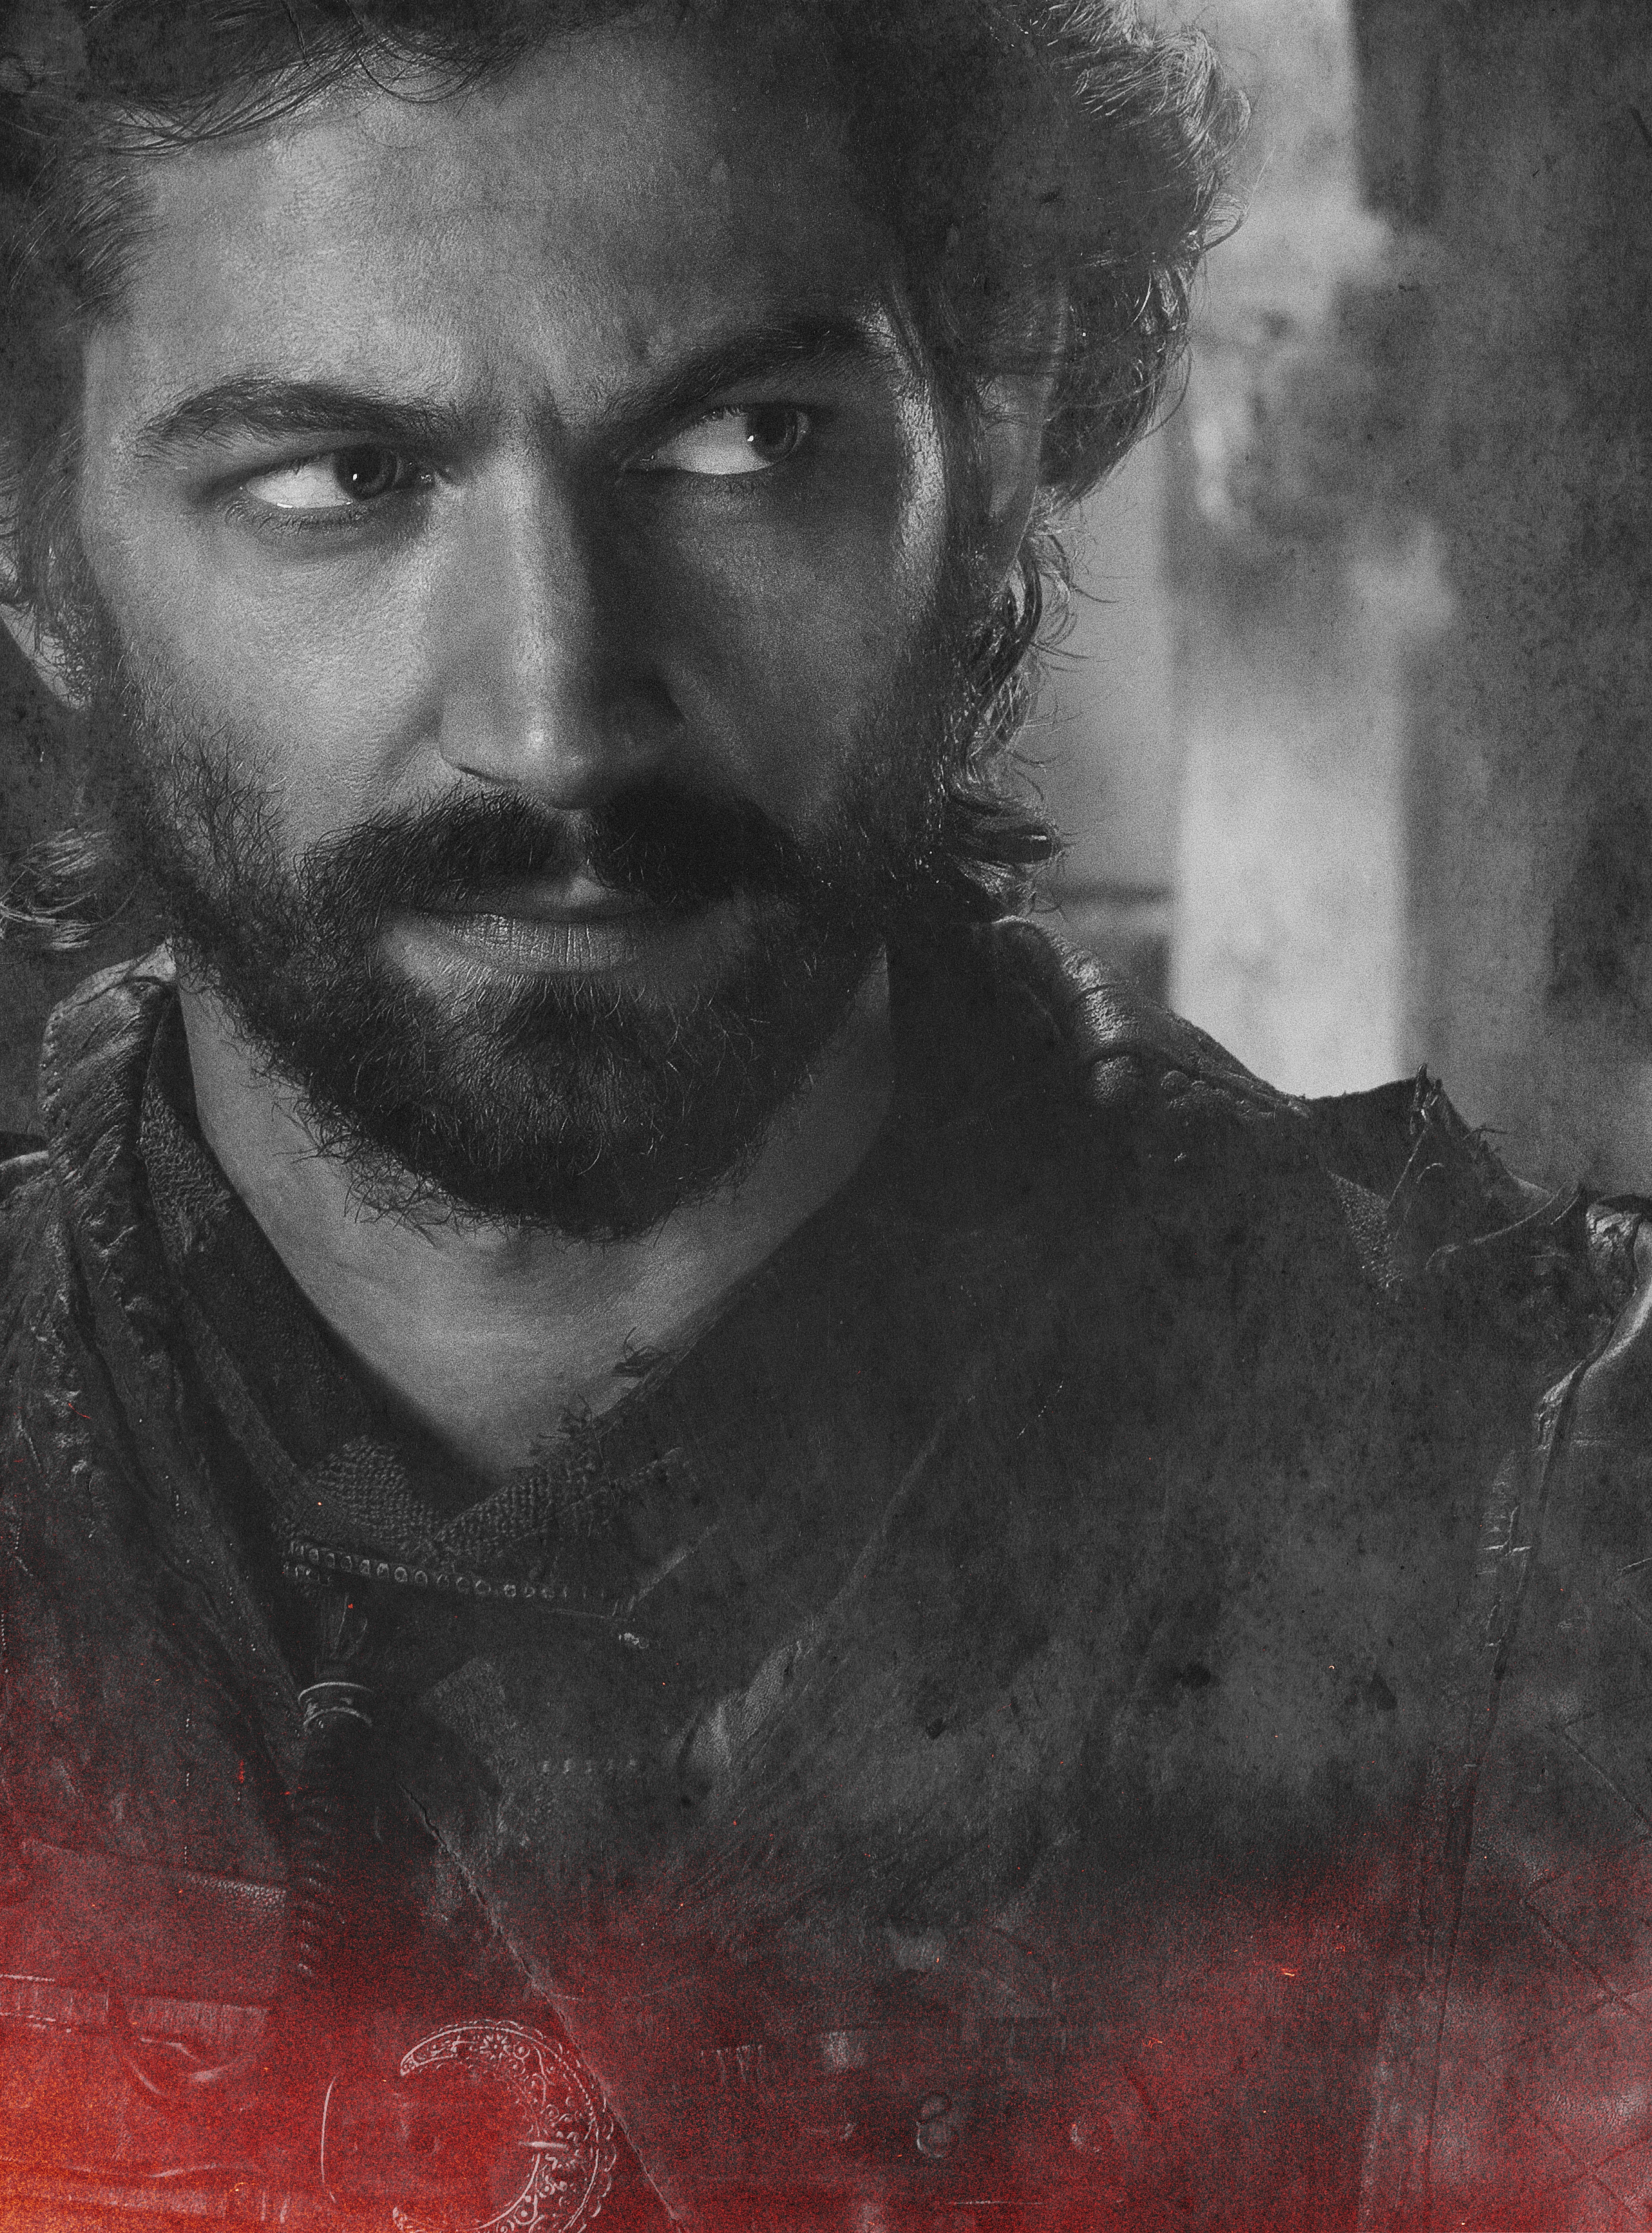 Game of thrones saison 4 Daario | Game Of Thrones Le Trône ... Daario Naharis Game Of Thrones Season 4